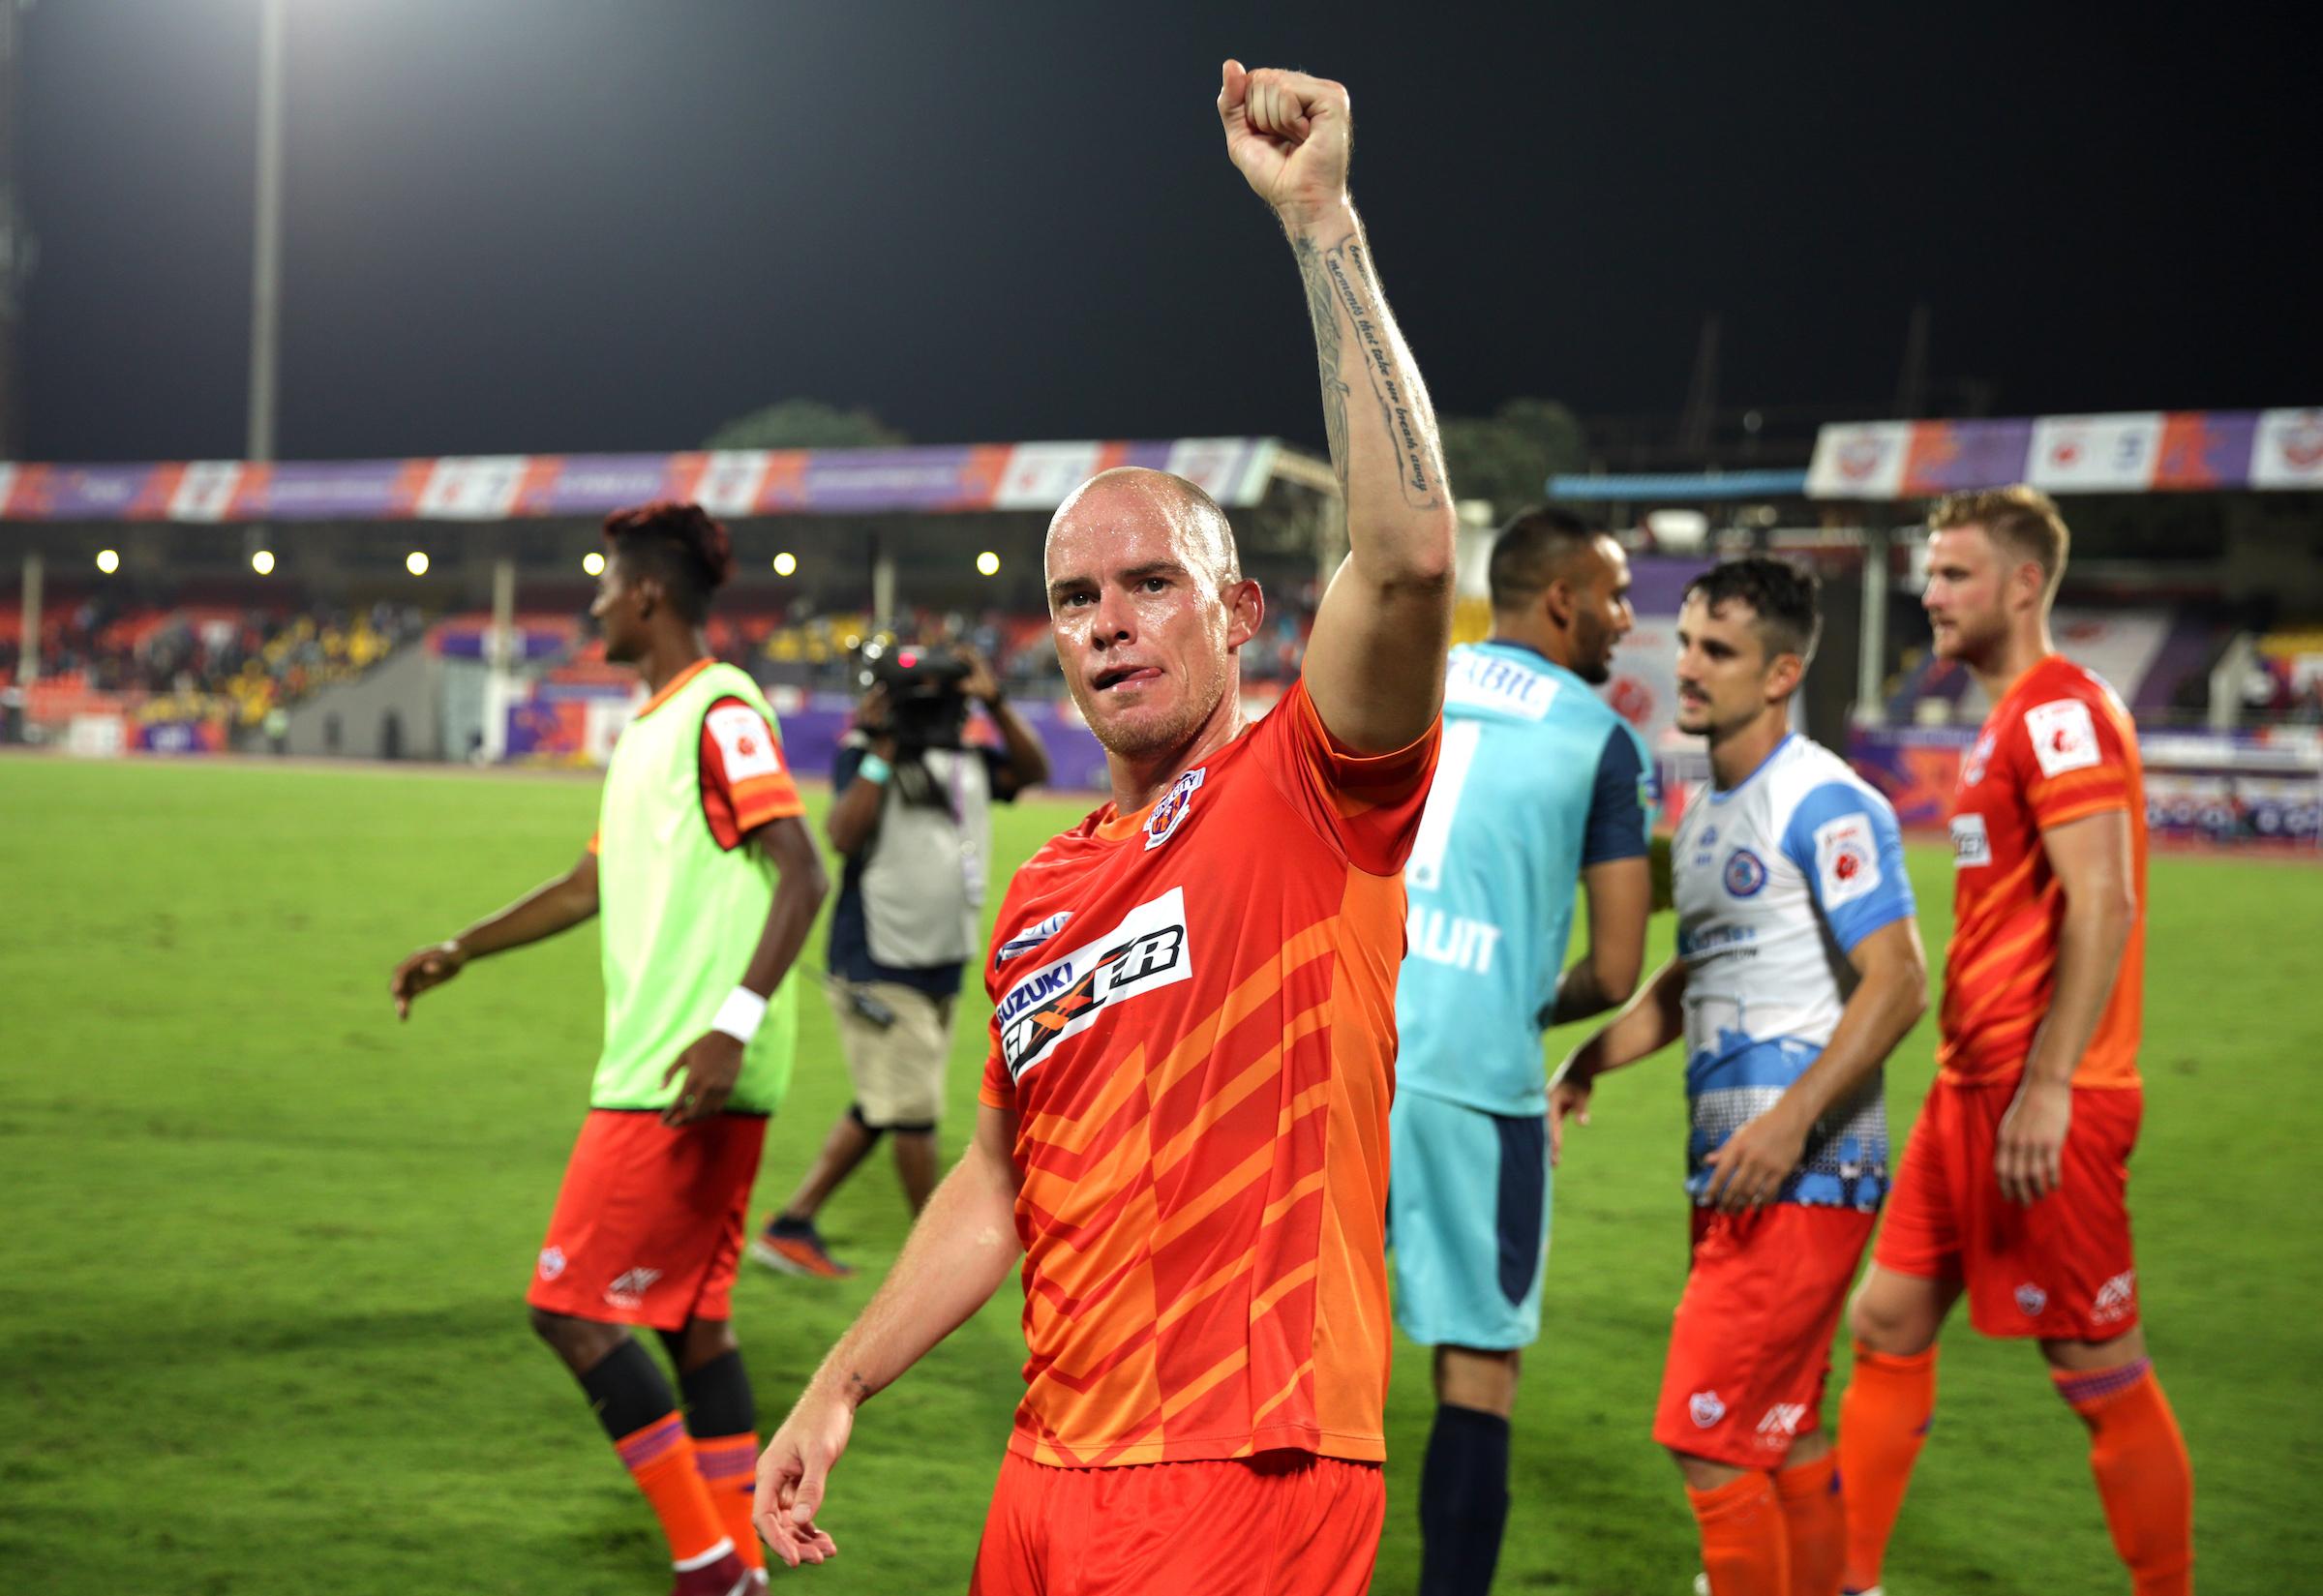 Iain Hume FC Pune City ISL 2018-19